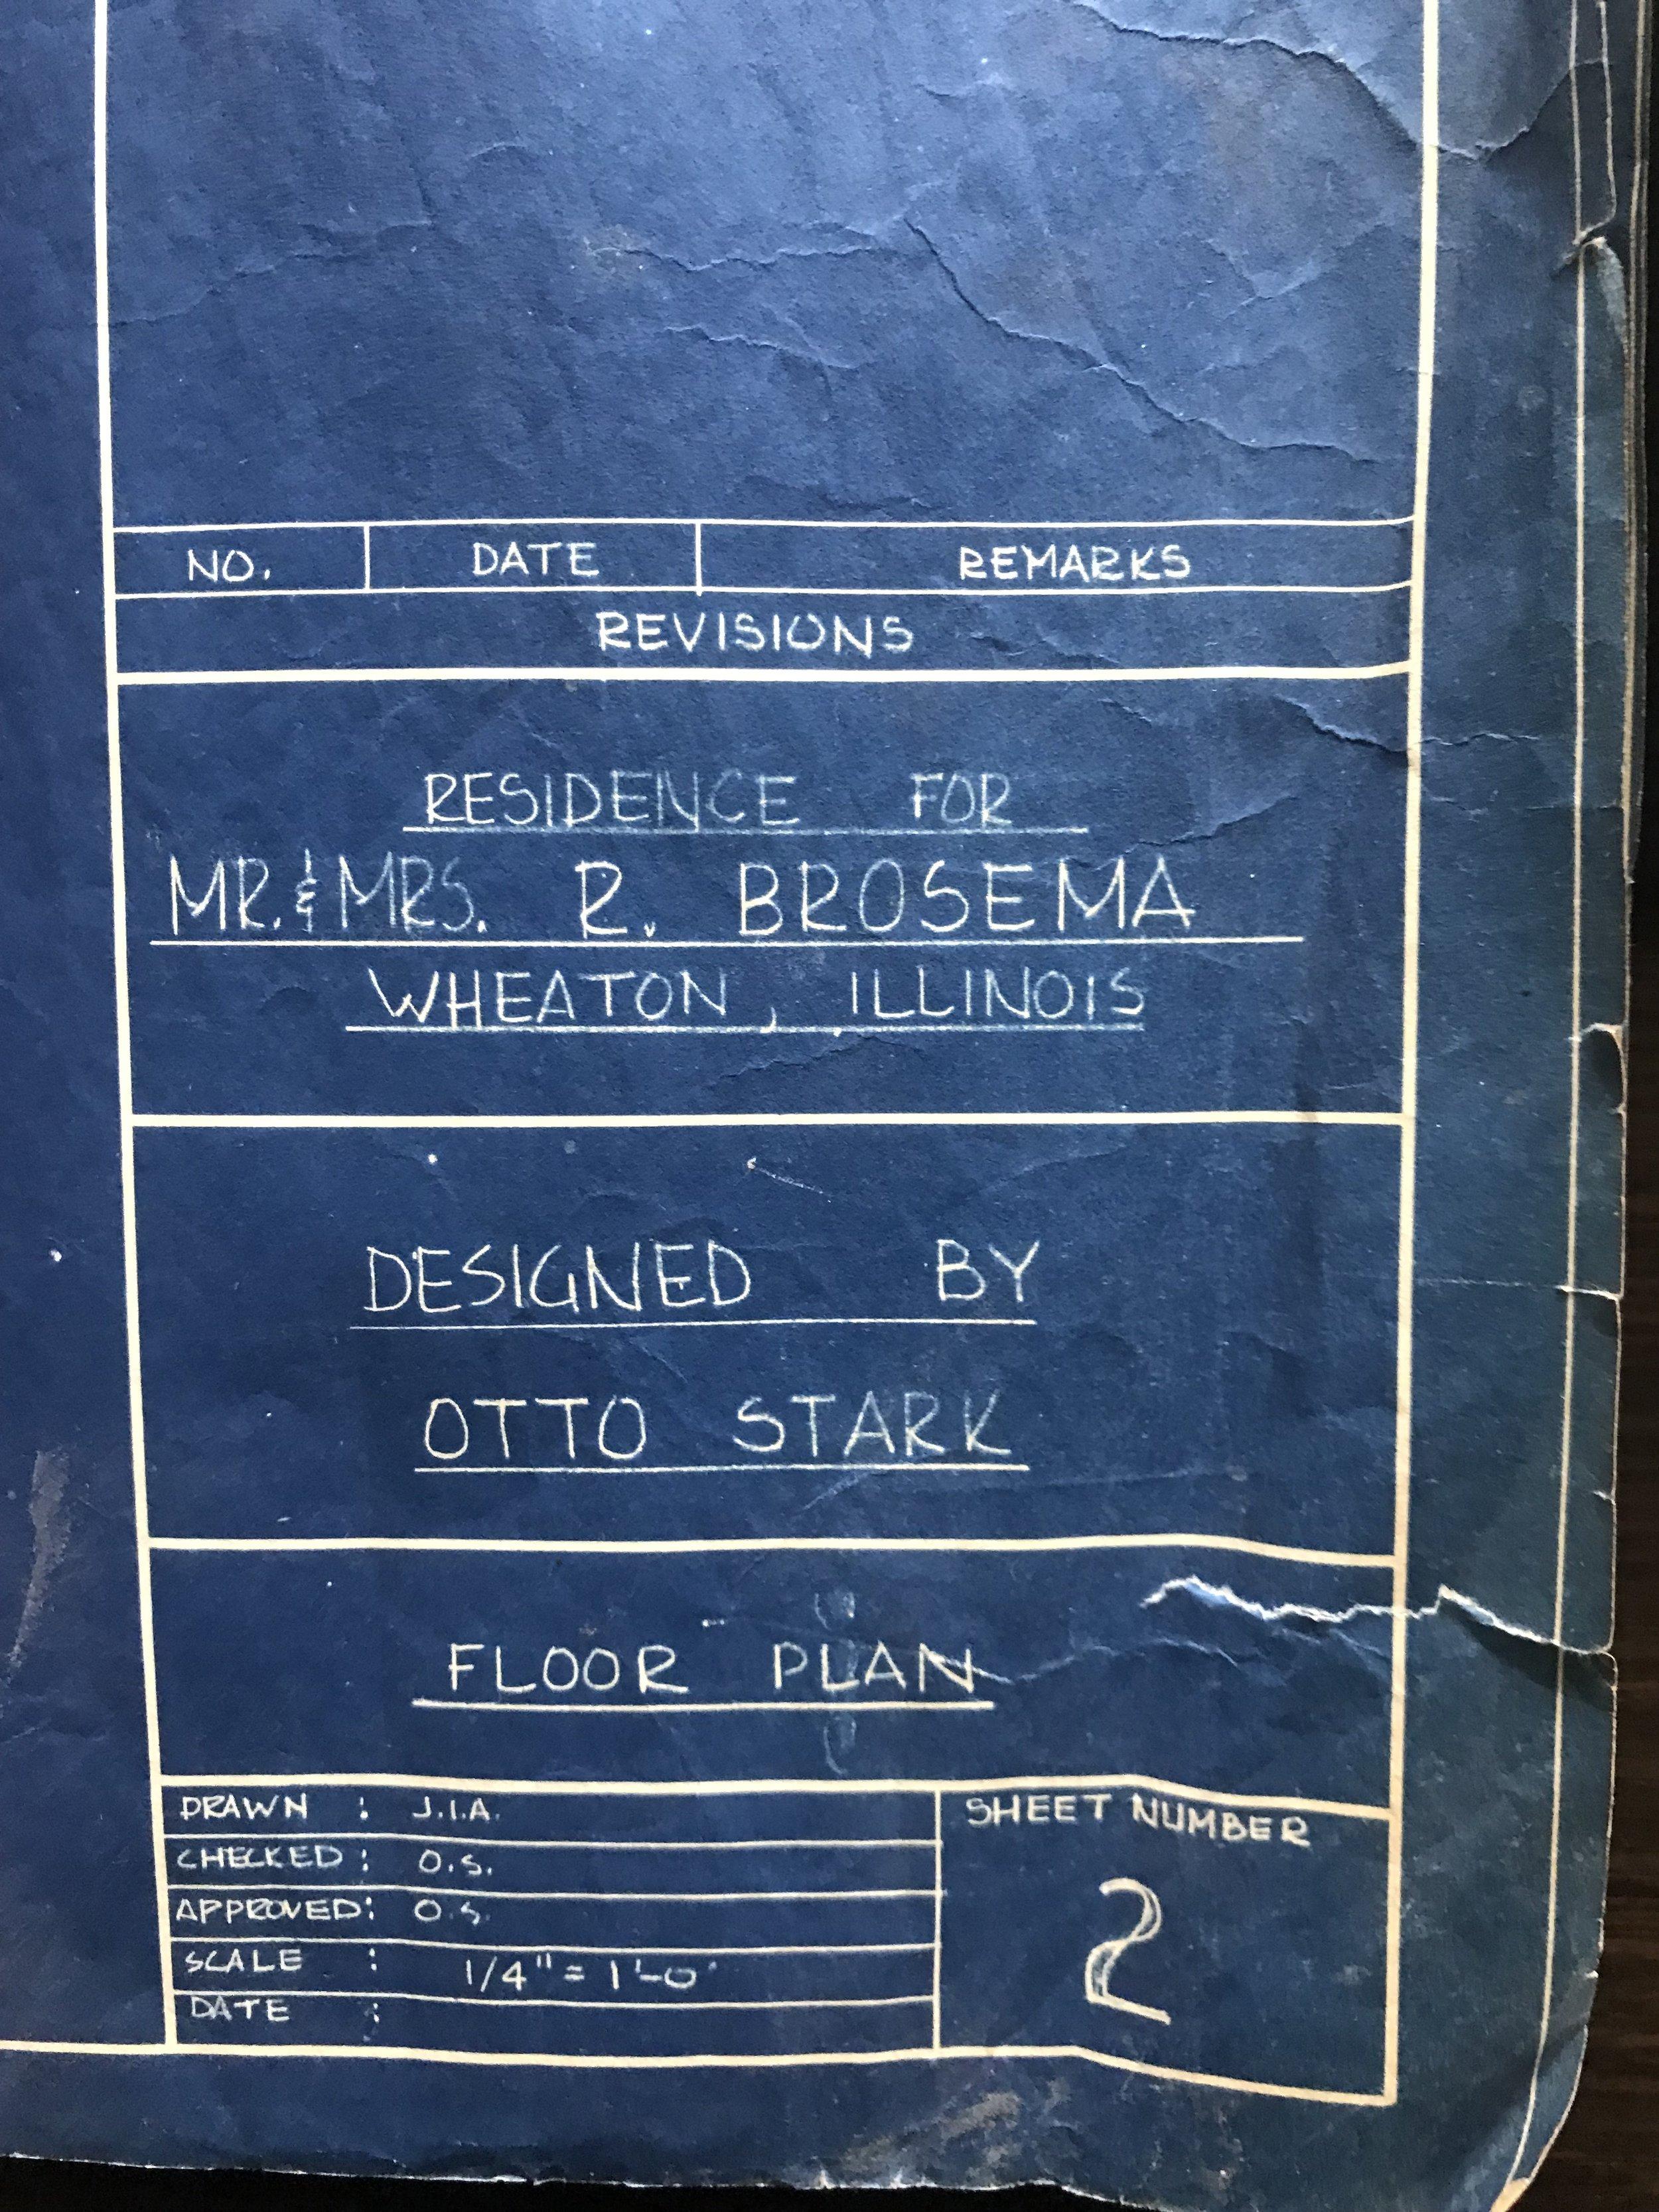 Original Blueprints by Otto Stark